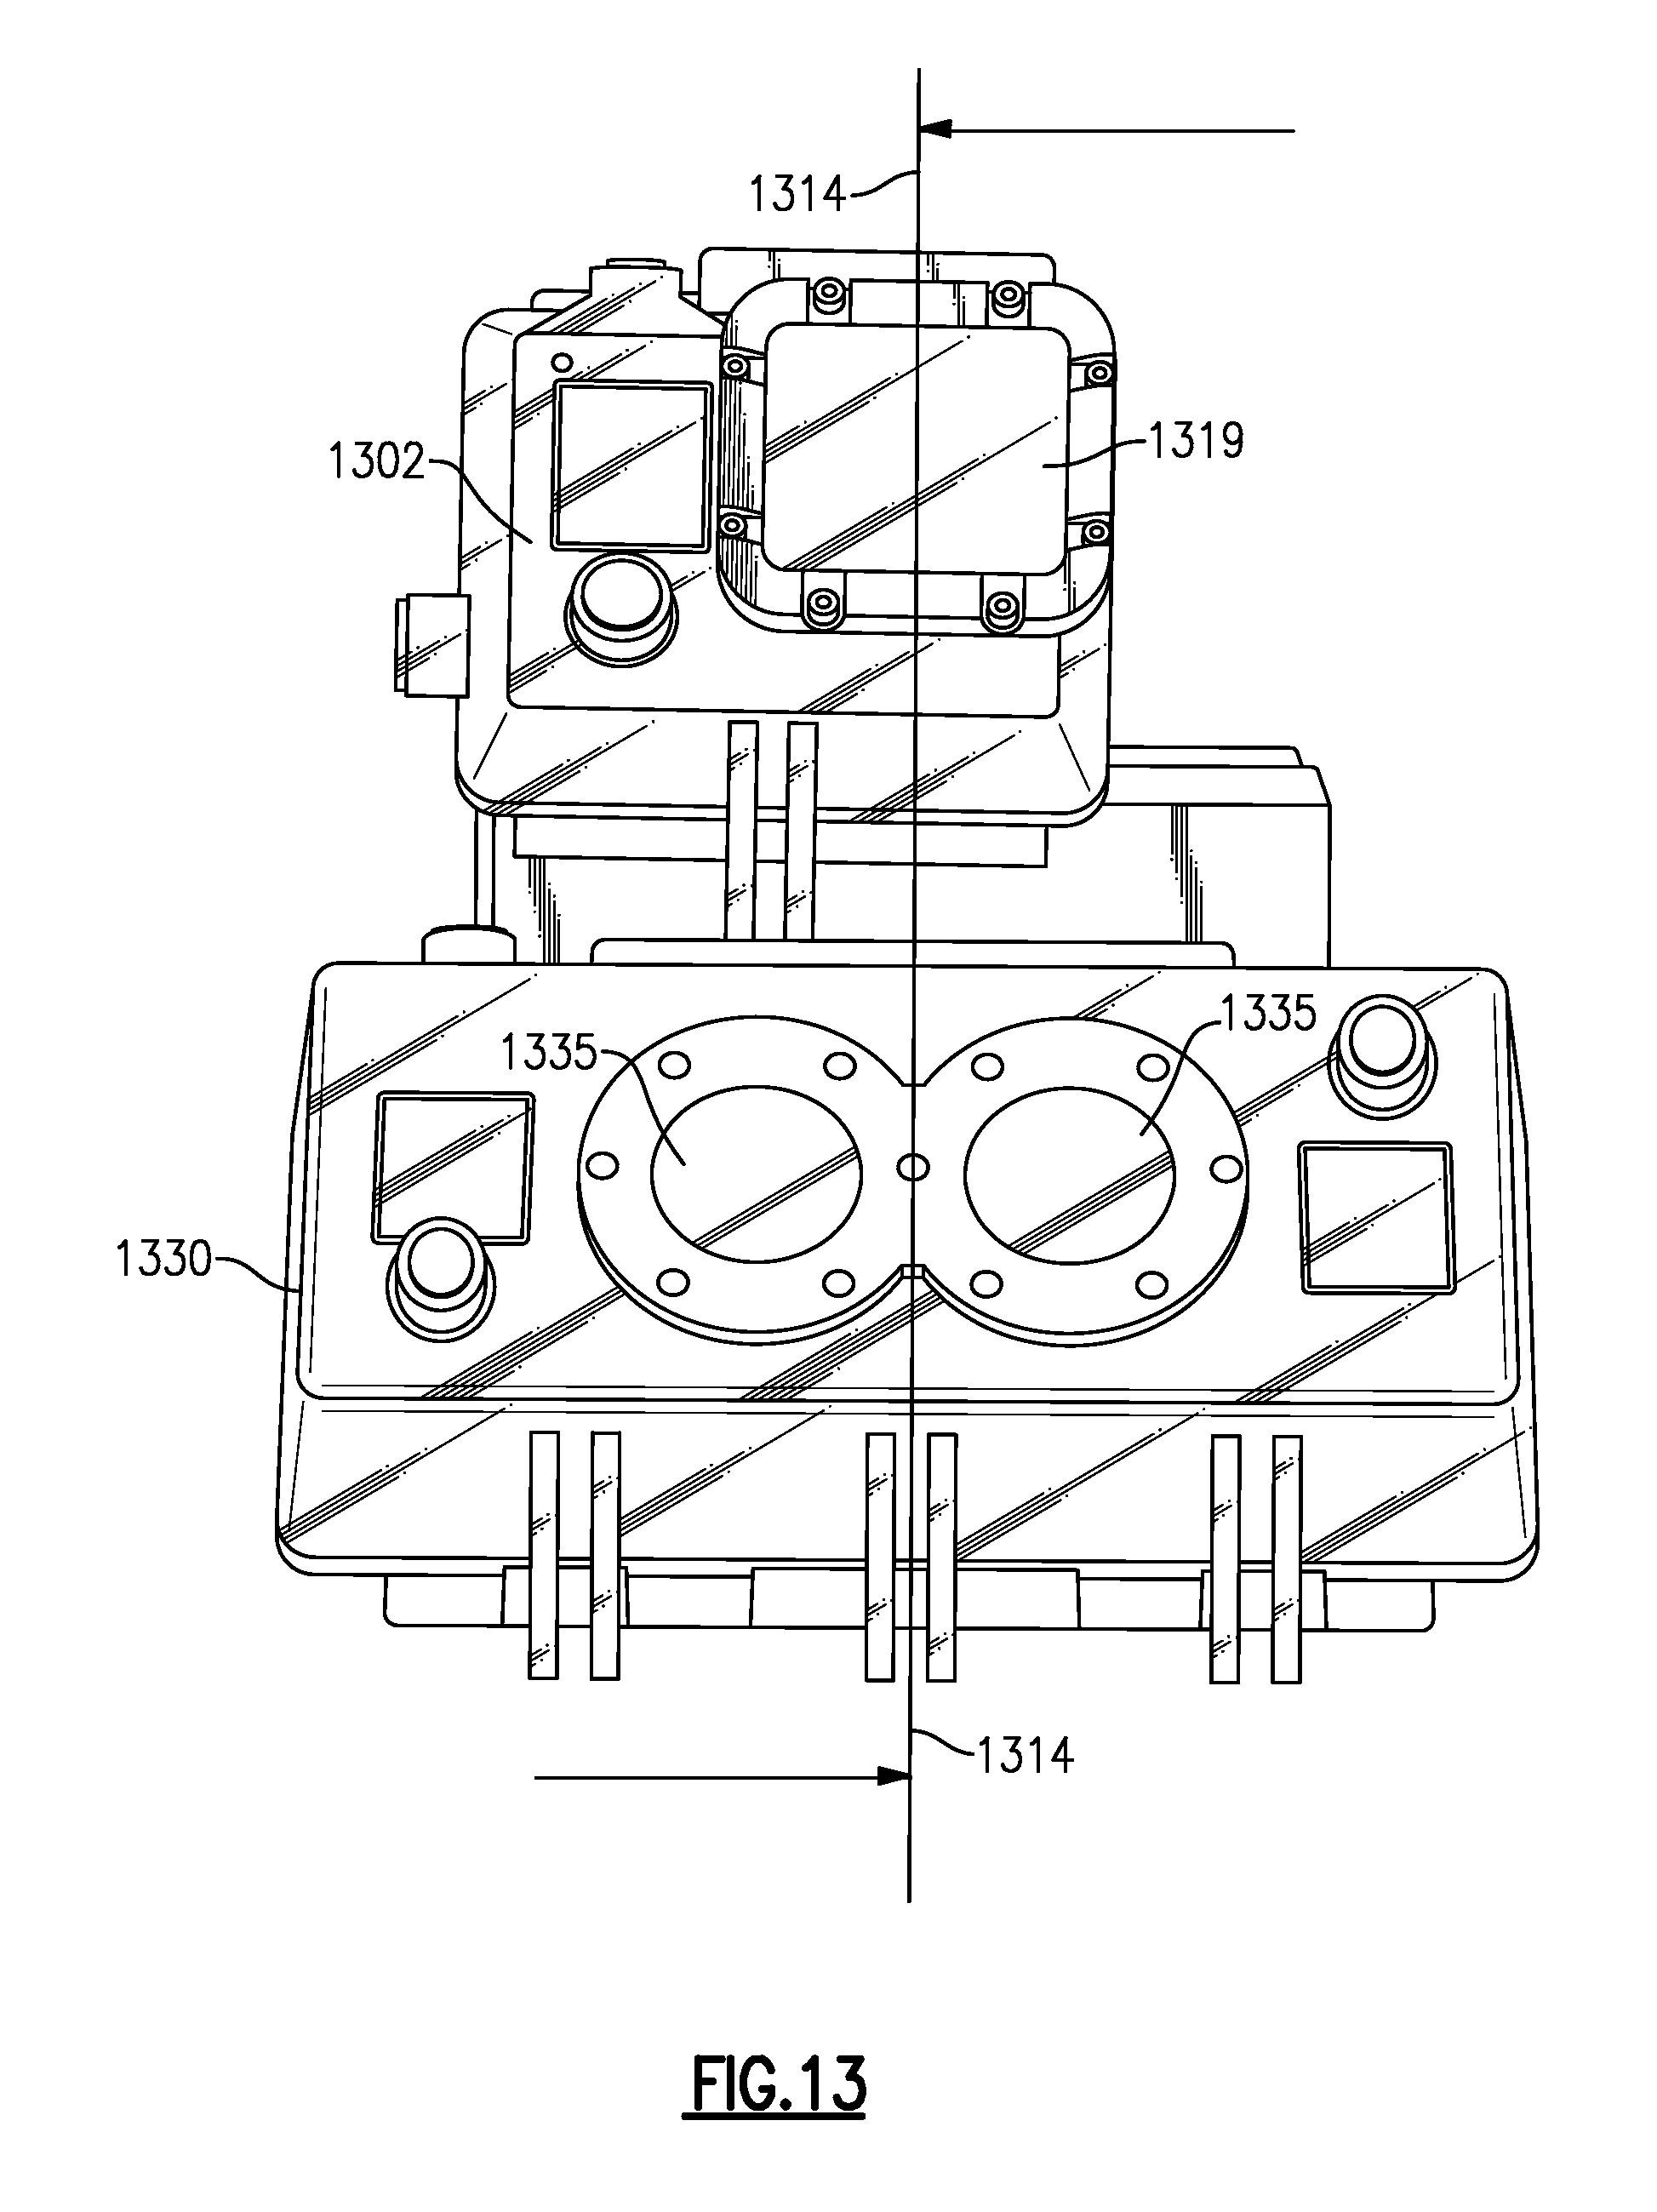 Ford Taurus Wiring Diagram Dolgular Com